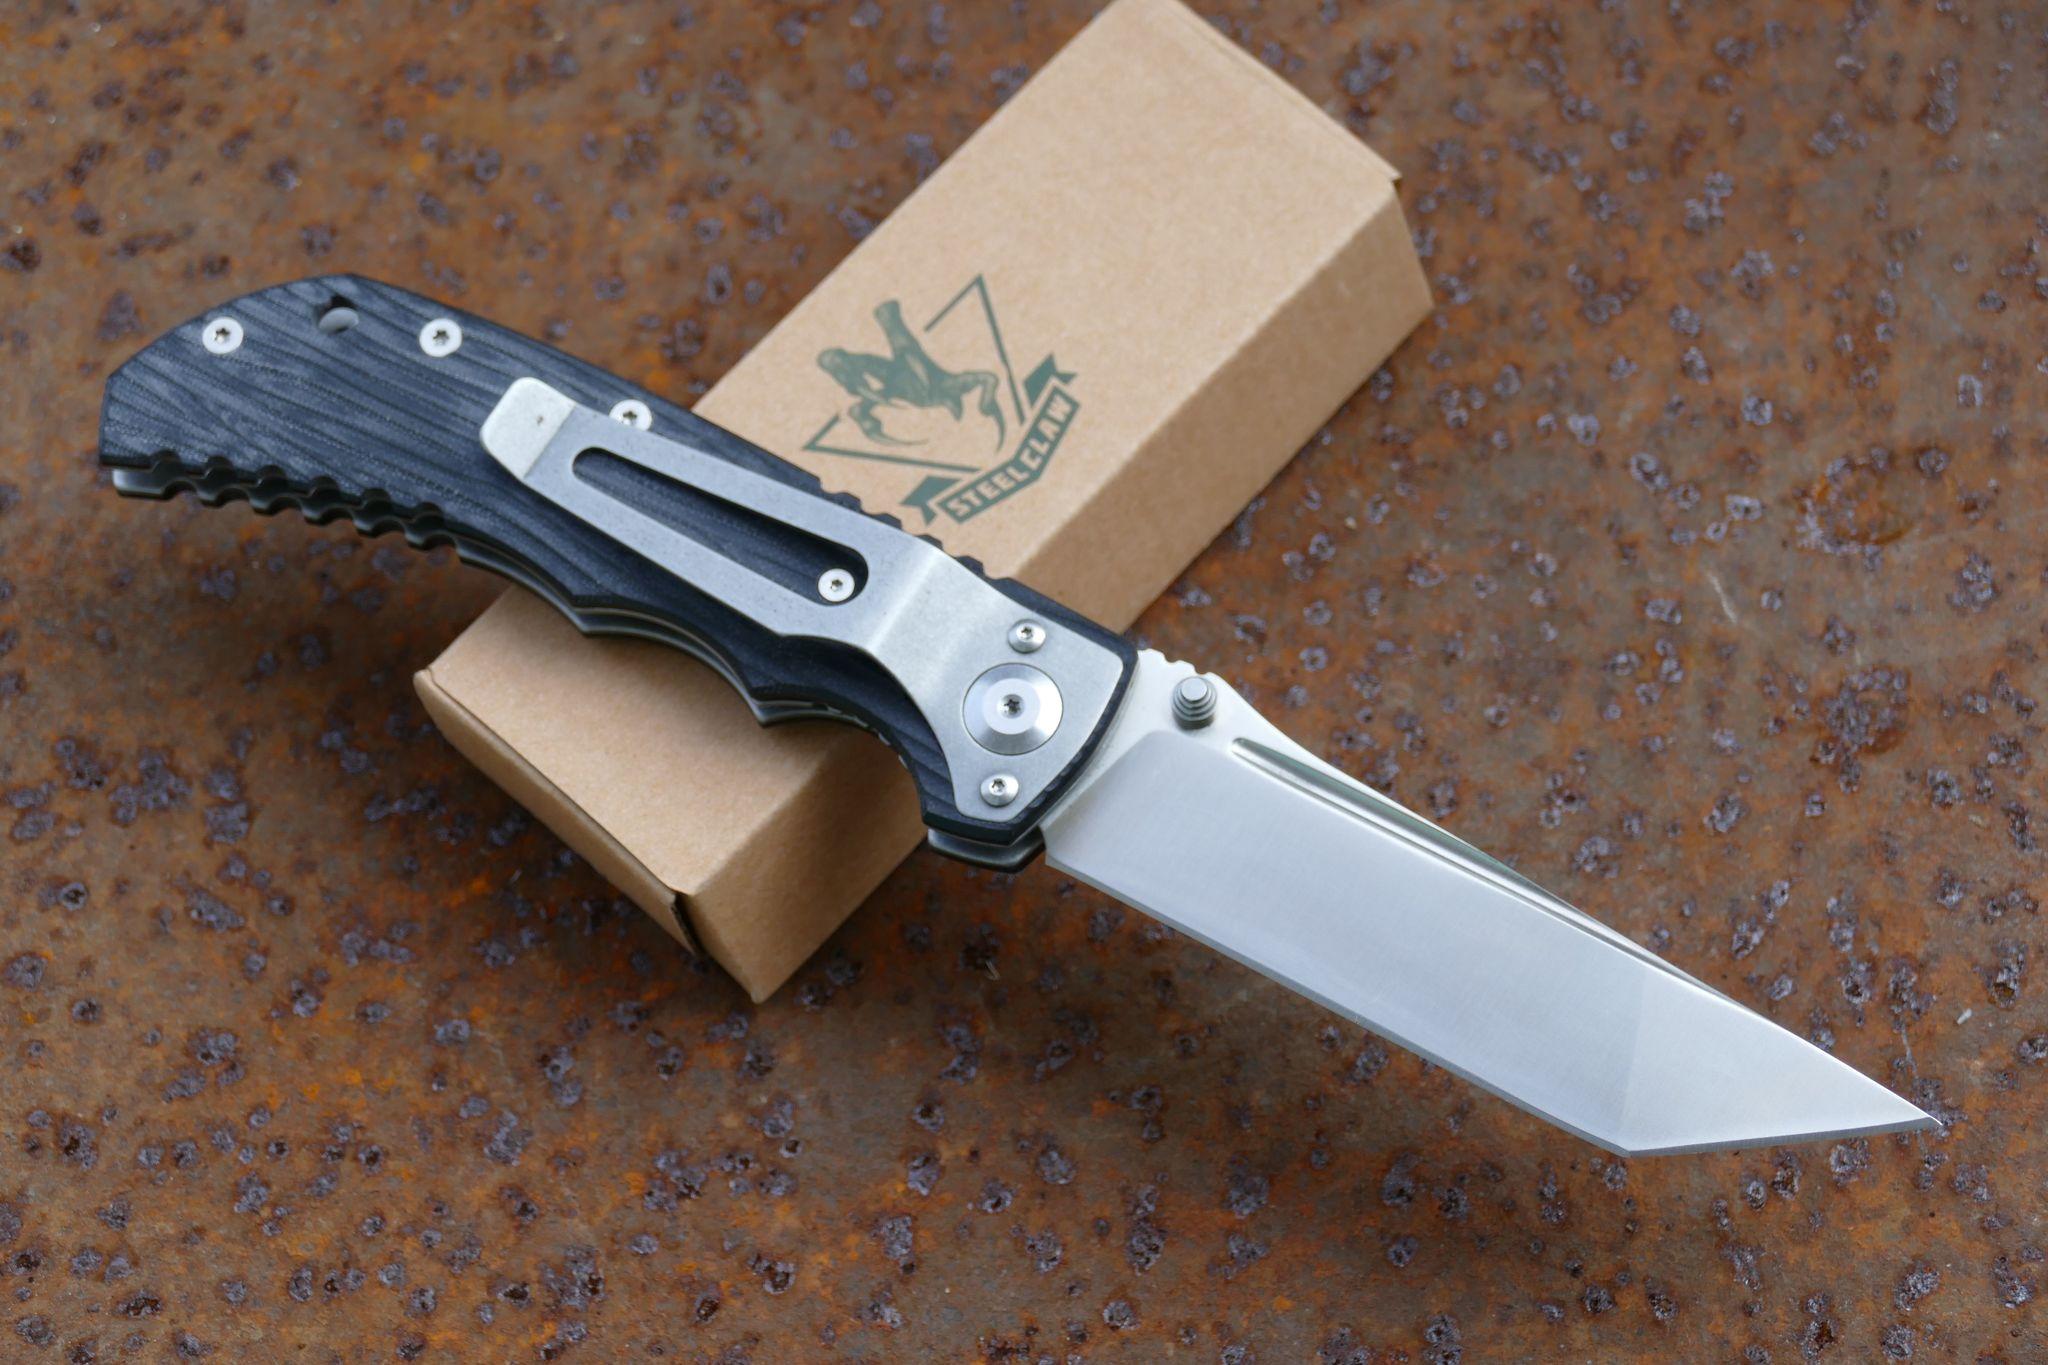 Фото 2 - Складной нож Рейнджер T6 от Steelclaw